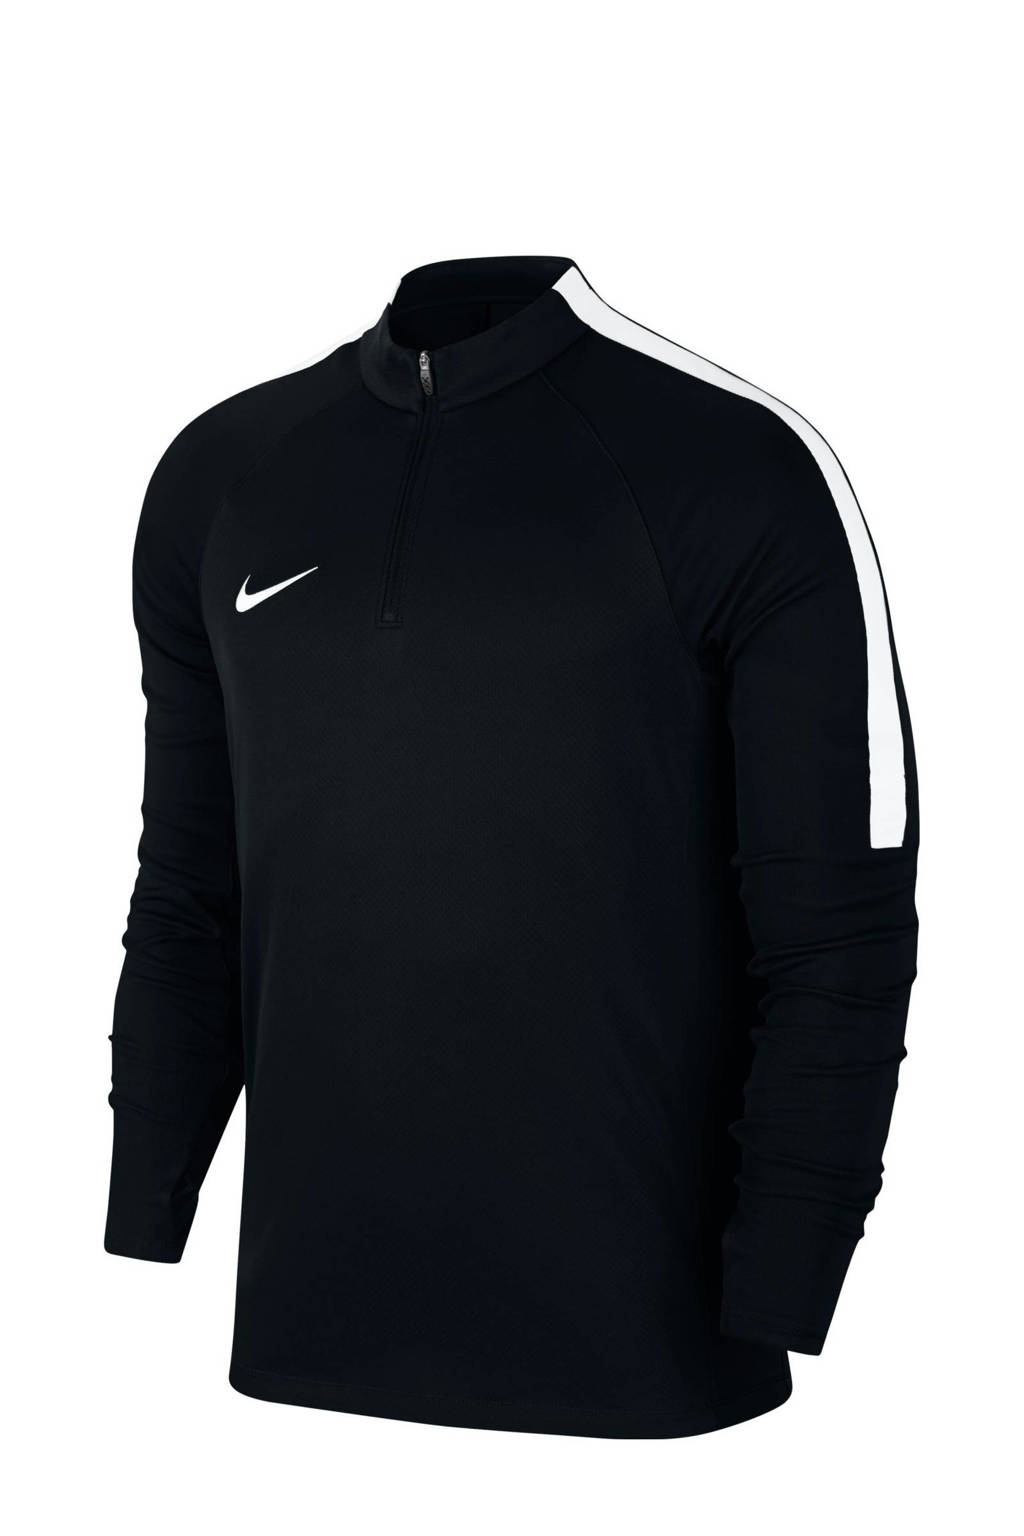 Nike   sport T-shirt zwart/wit, Zwart/wit